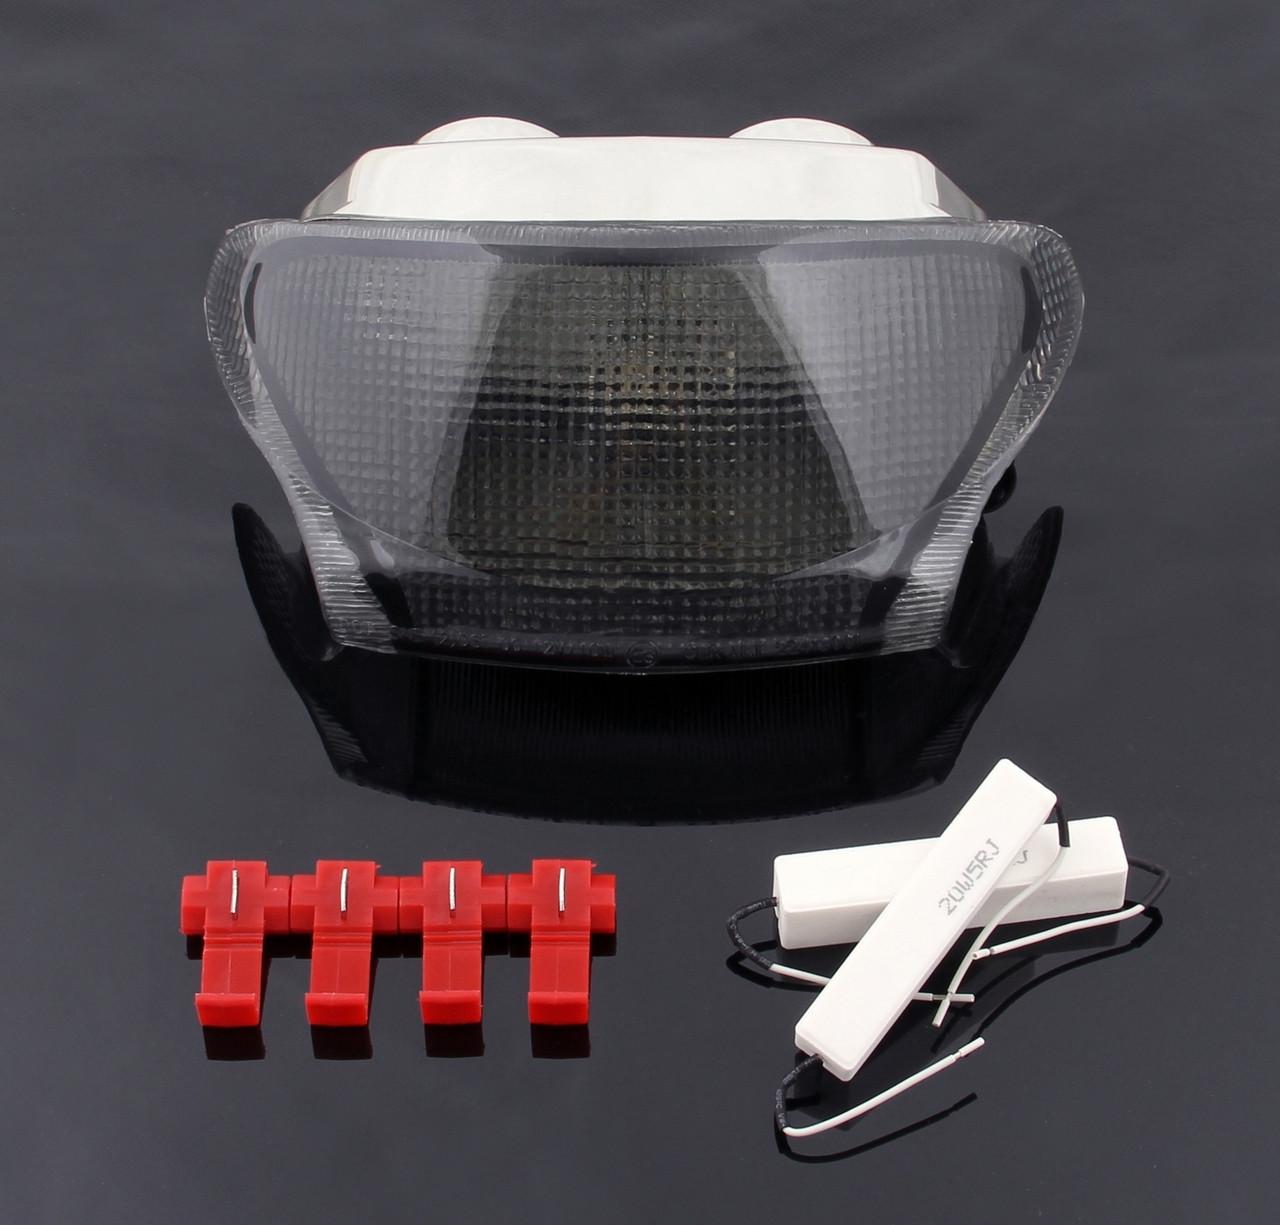 http://www.madhornets.store/AMZ/MotoPart/Taillight/TL-430/TL-430-Smoke-1.jpg